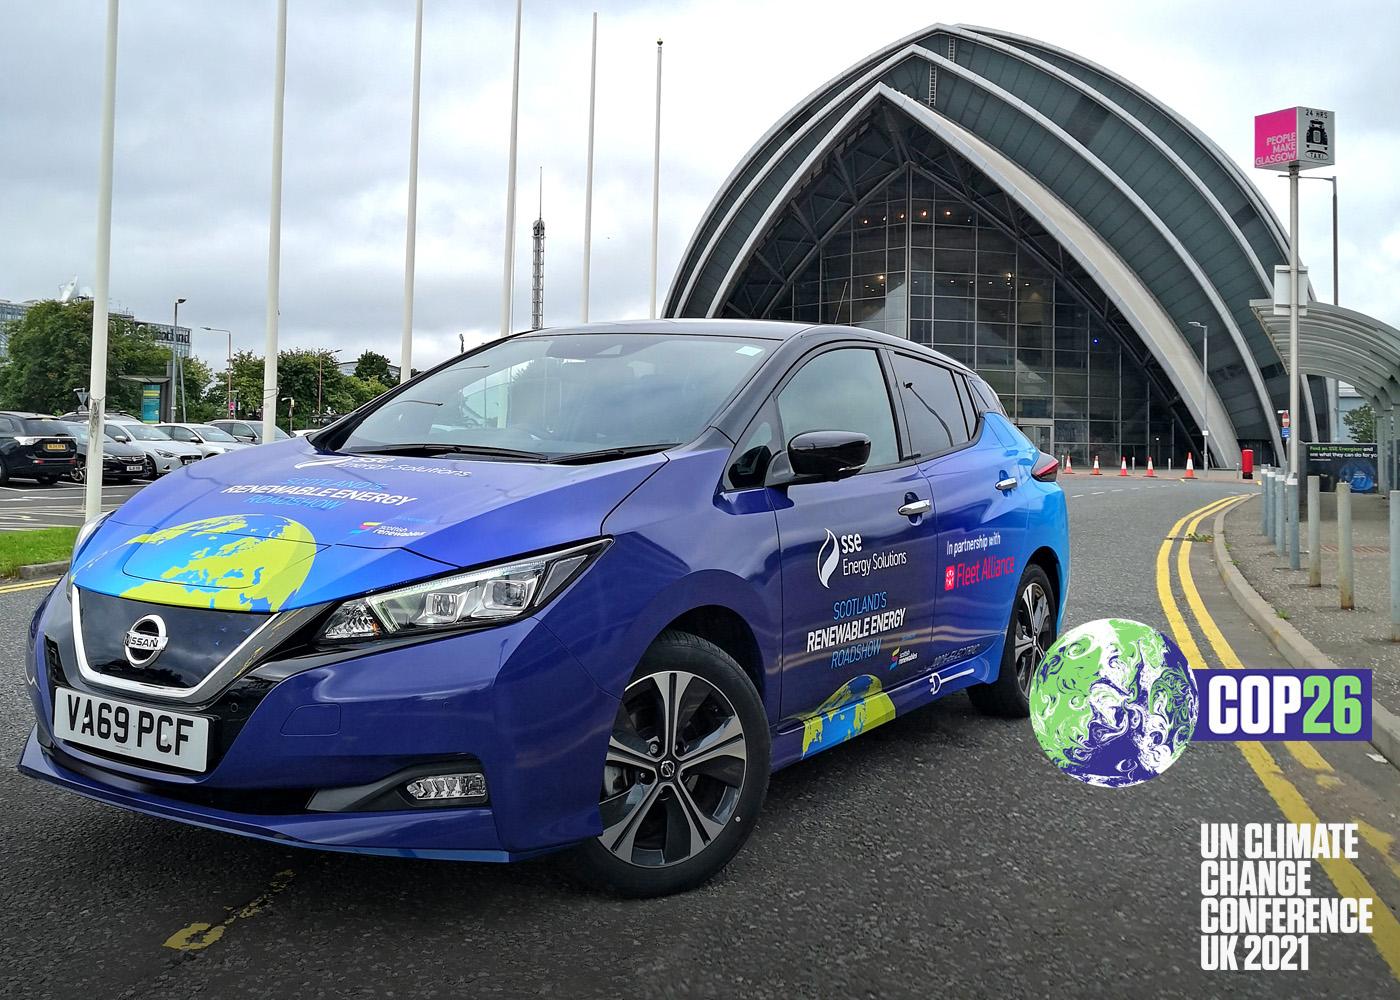 Fleet Alliance Provides the Driving Force Behind Scotland's Renewable Energy COP26 Roadshow